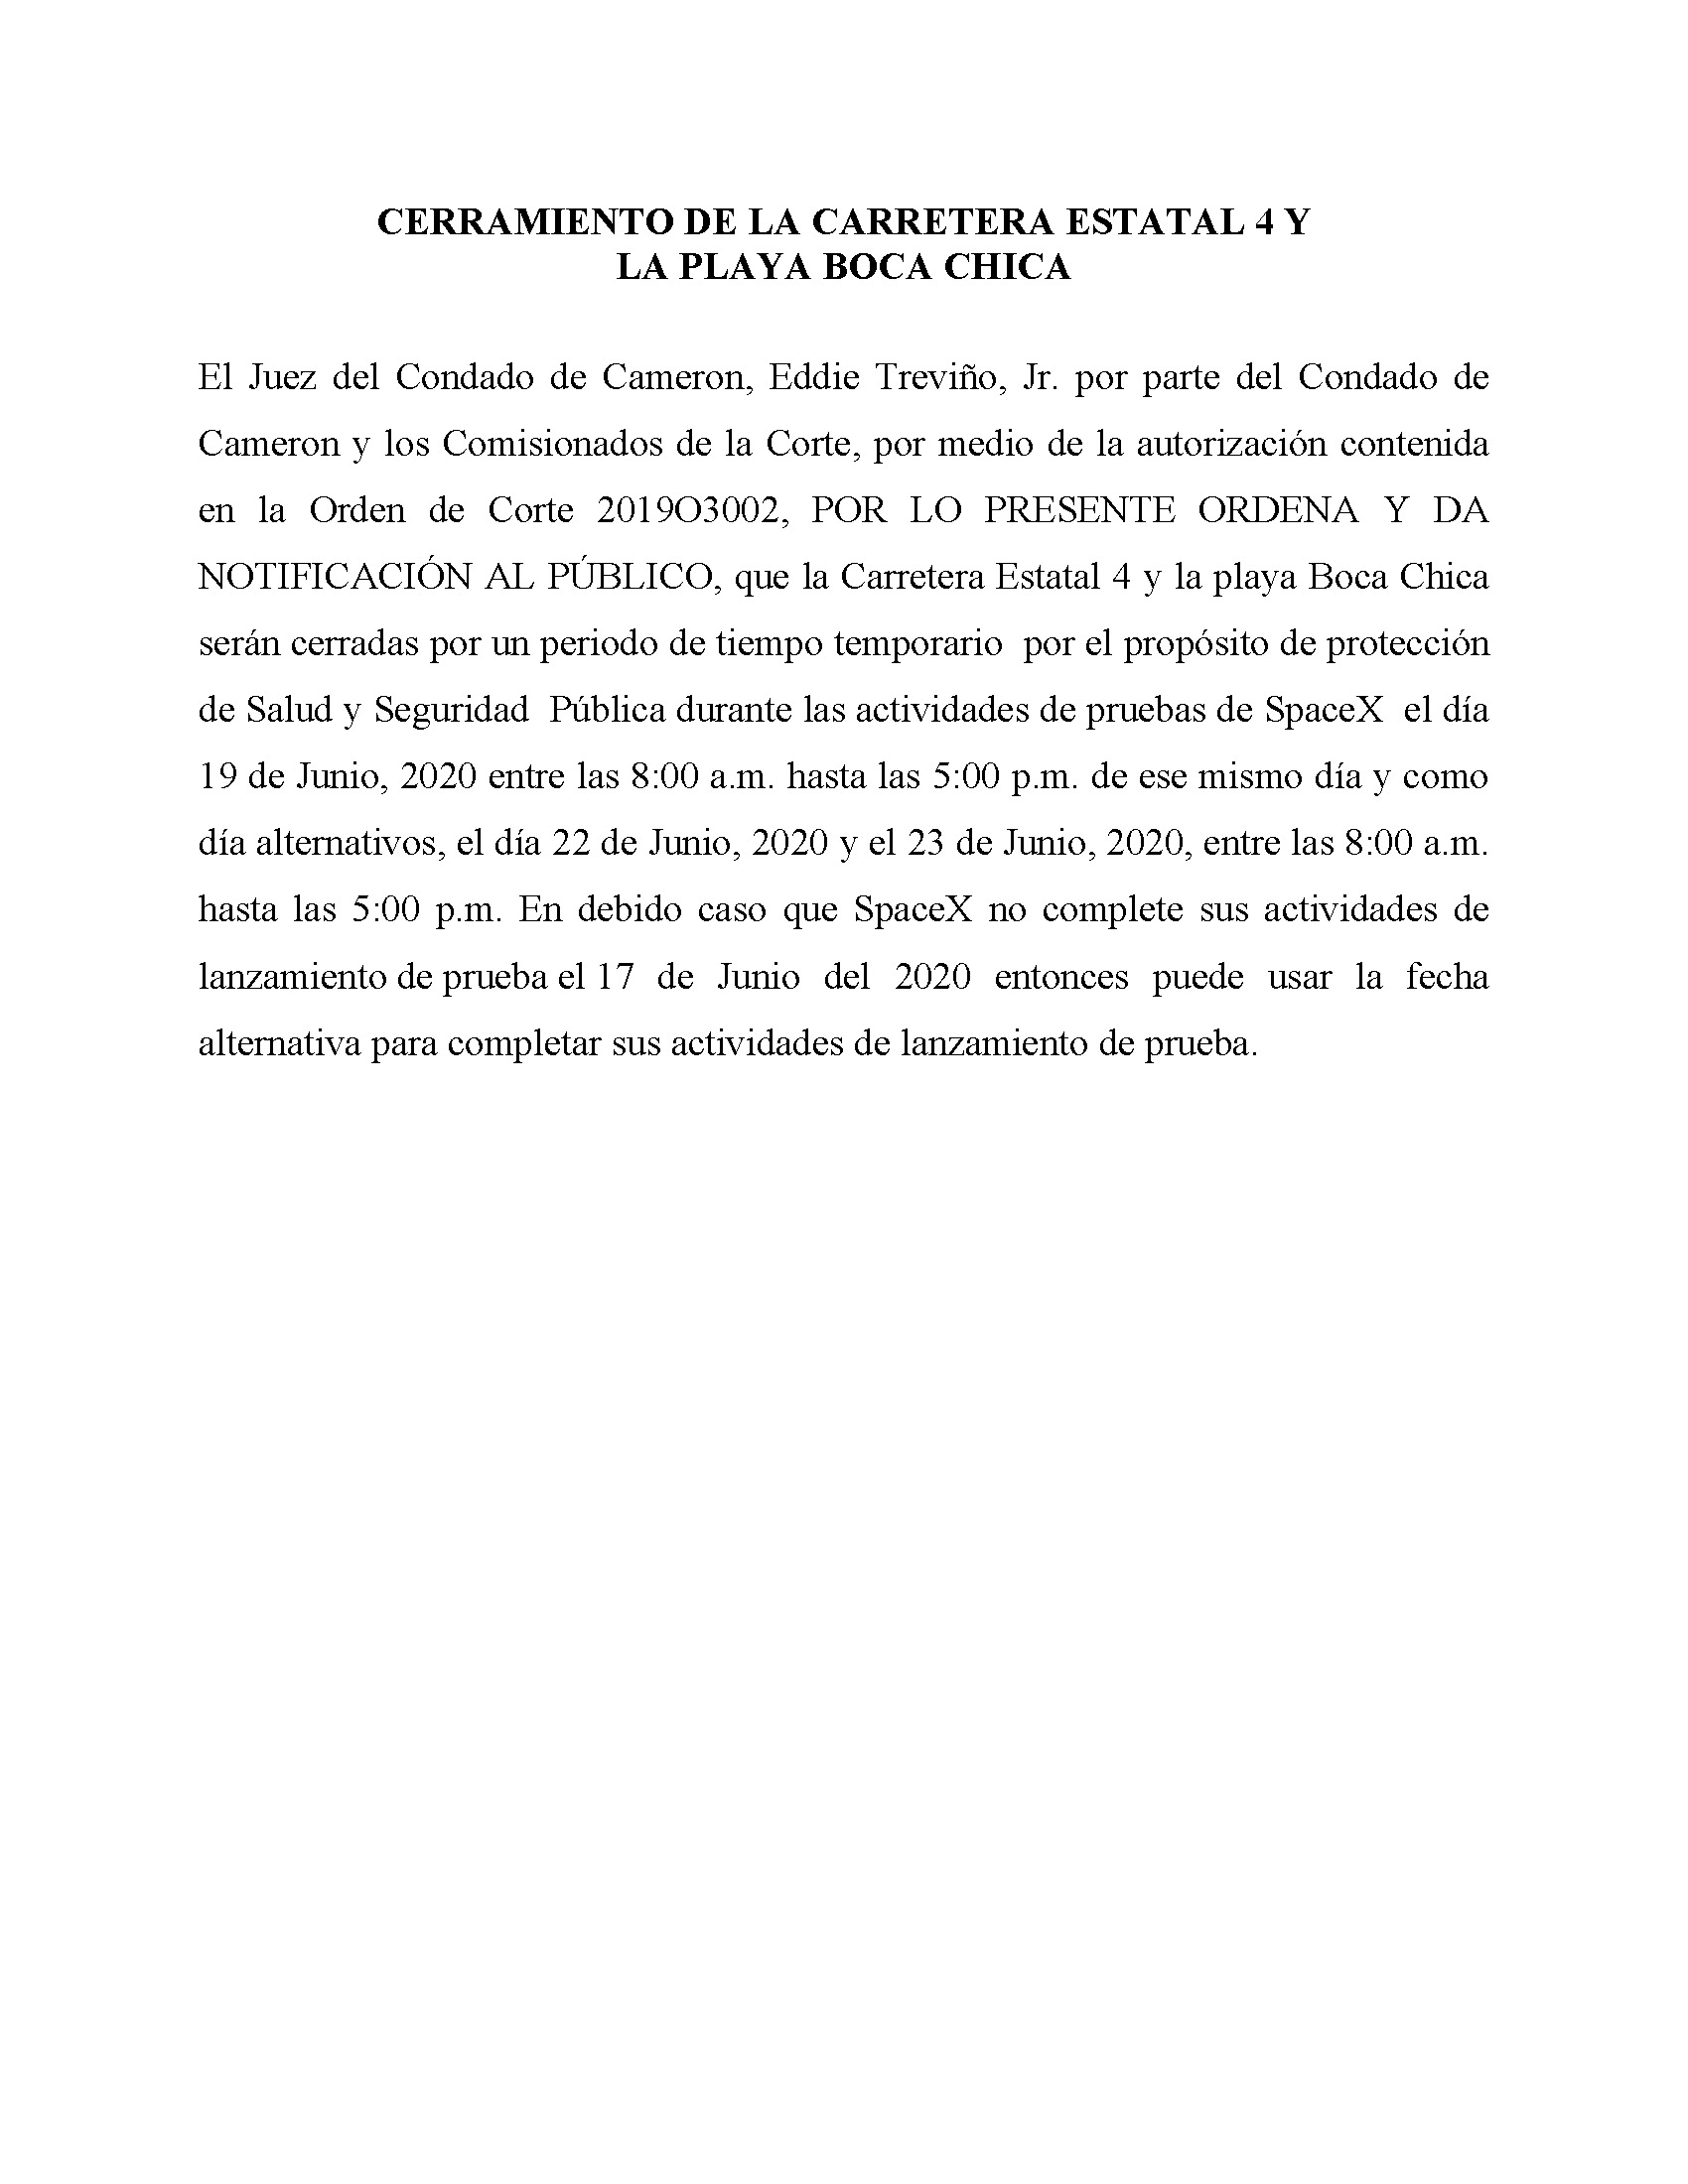 ORDER.CLOSURE OF HIGHWAY 4 Y LA PLAYA BOCA CHICA.SPANISH.06.19.20